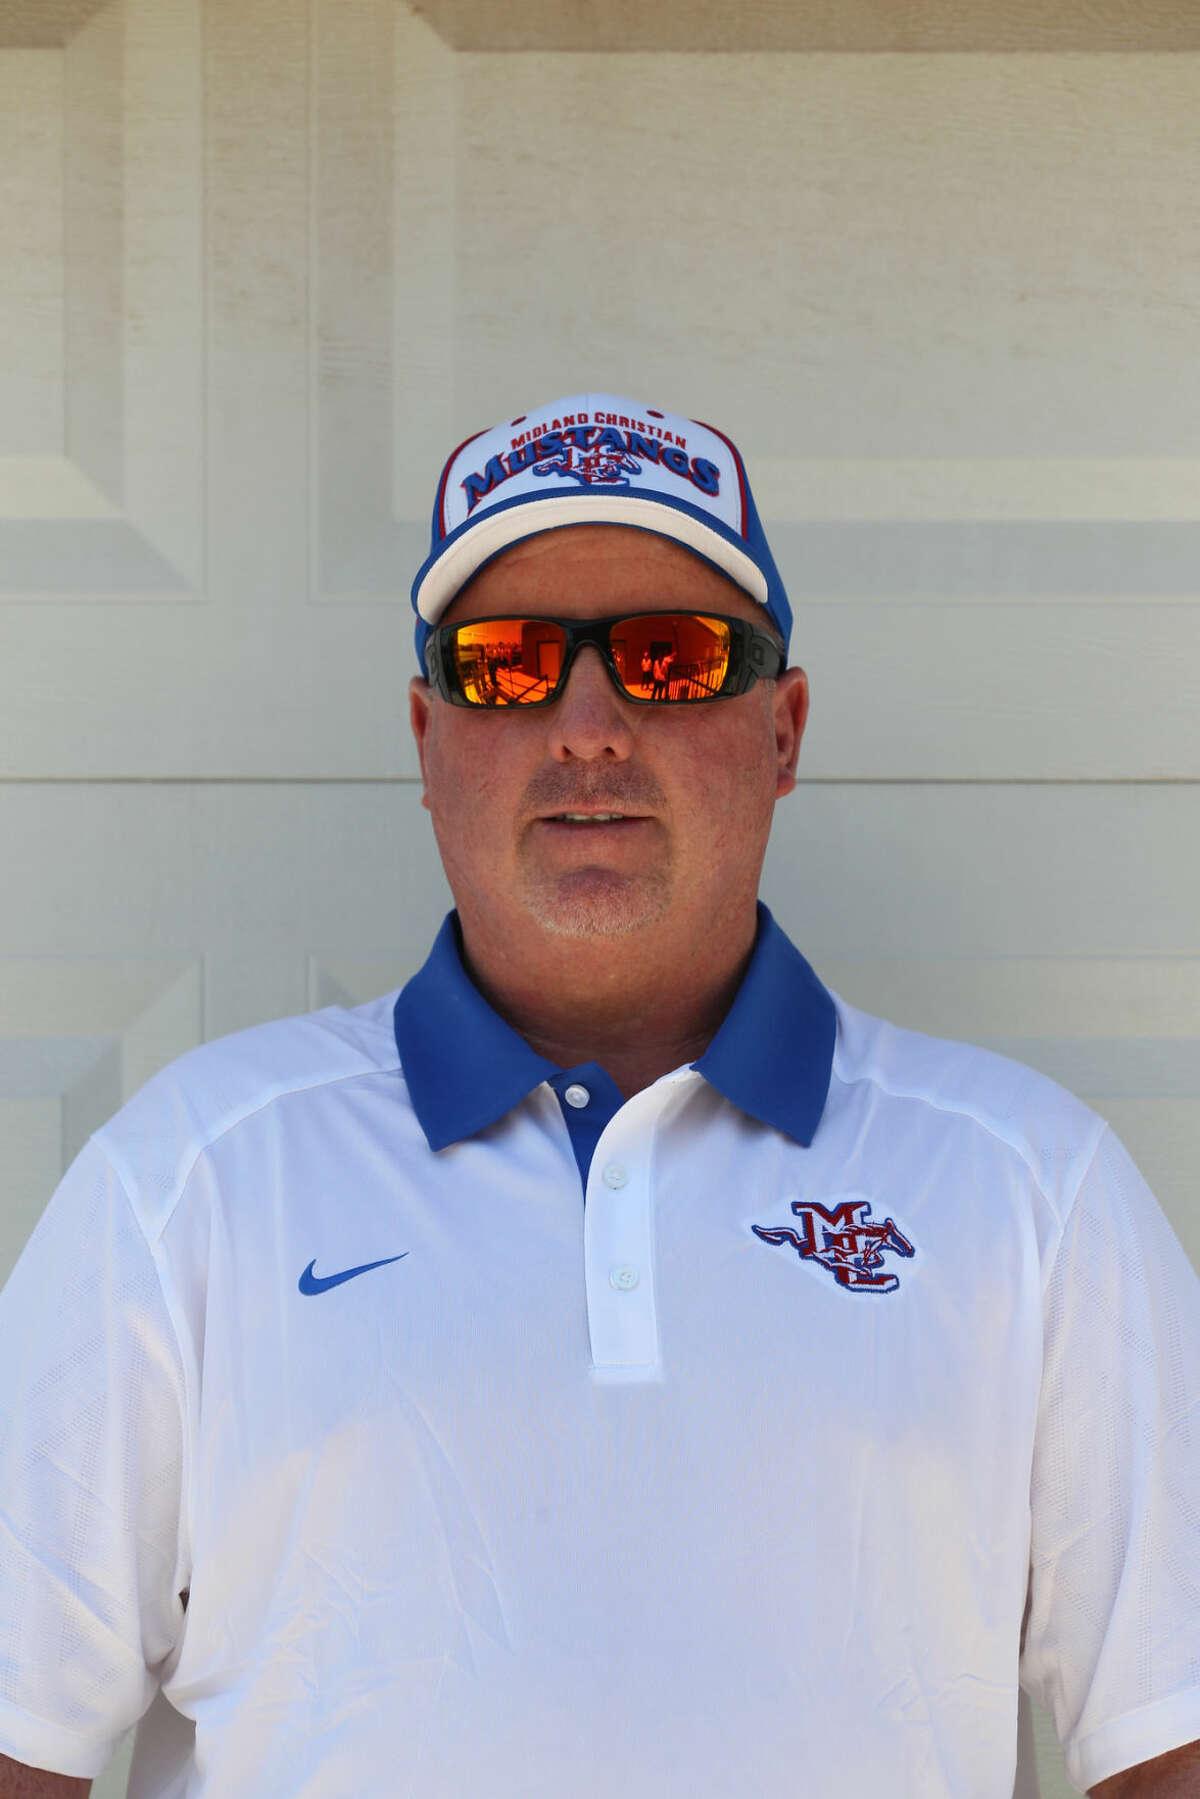 Mug of Midland Christian football head coach Greg McClendon photographed Thursday, August 6, 2015 at Midland Christian. James Durbin/Reporter-Telegram